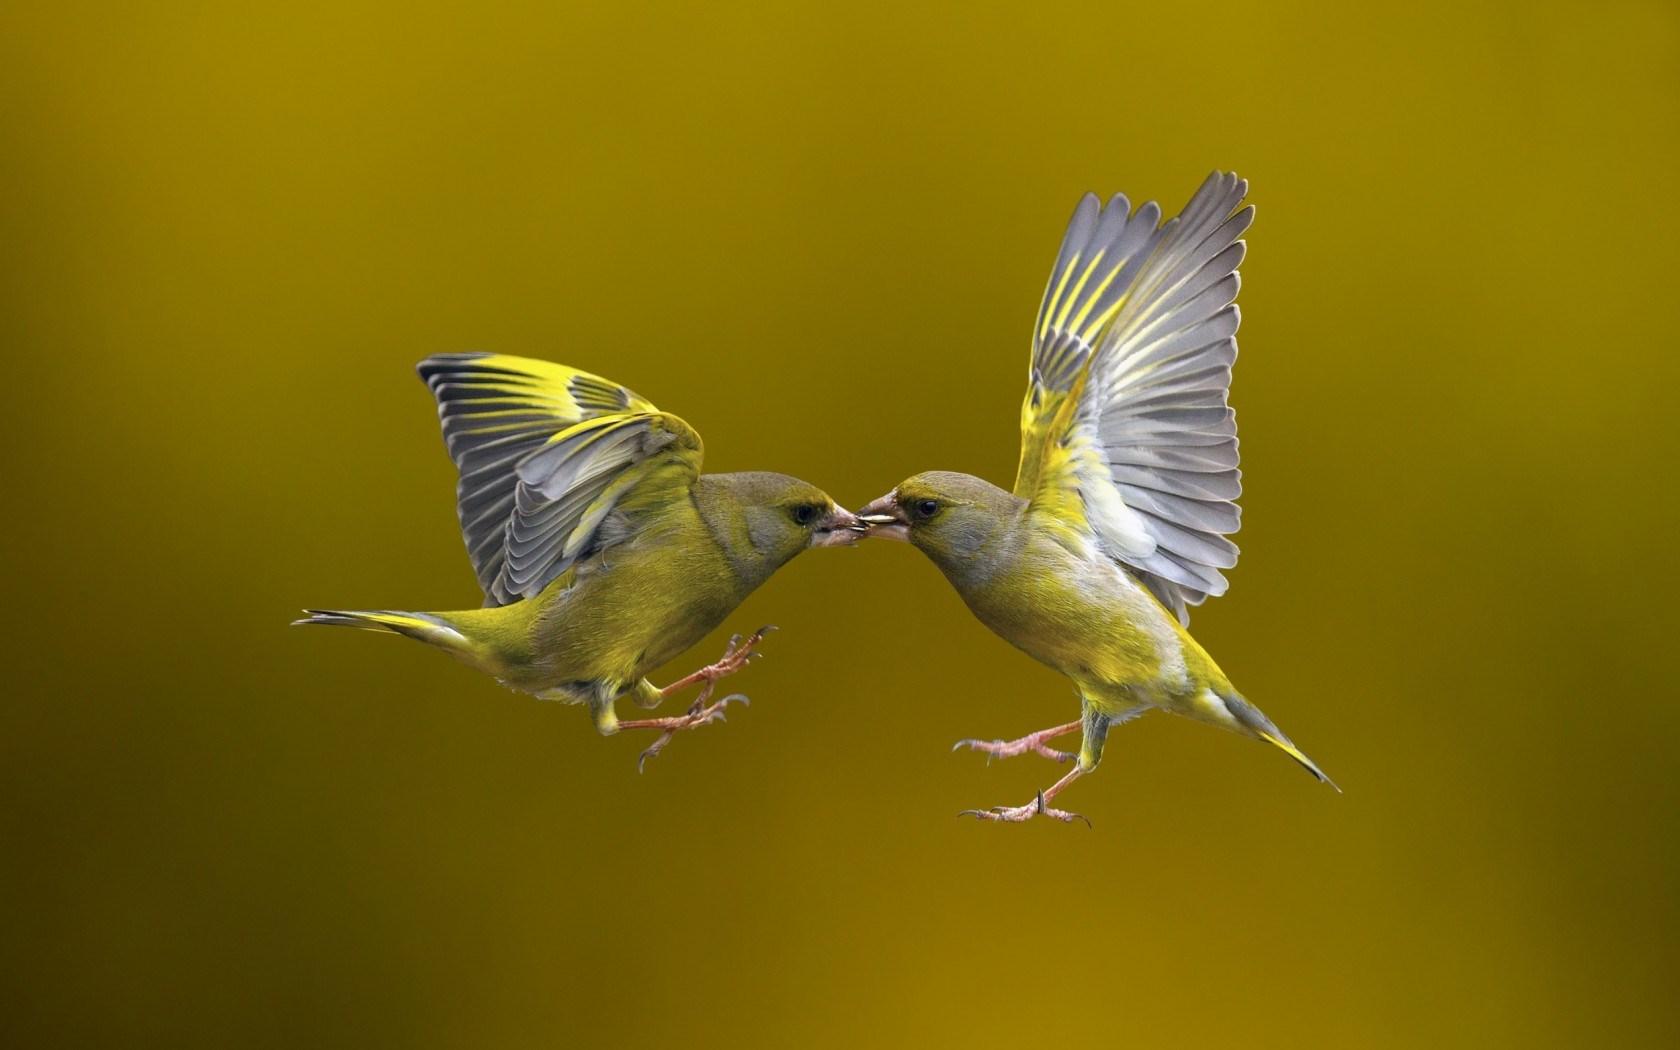 Bird Flight Wallpaper Hd 44327 1680x1050px